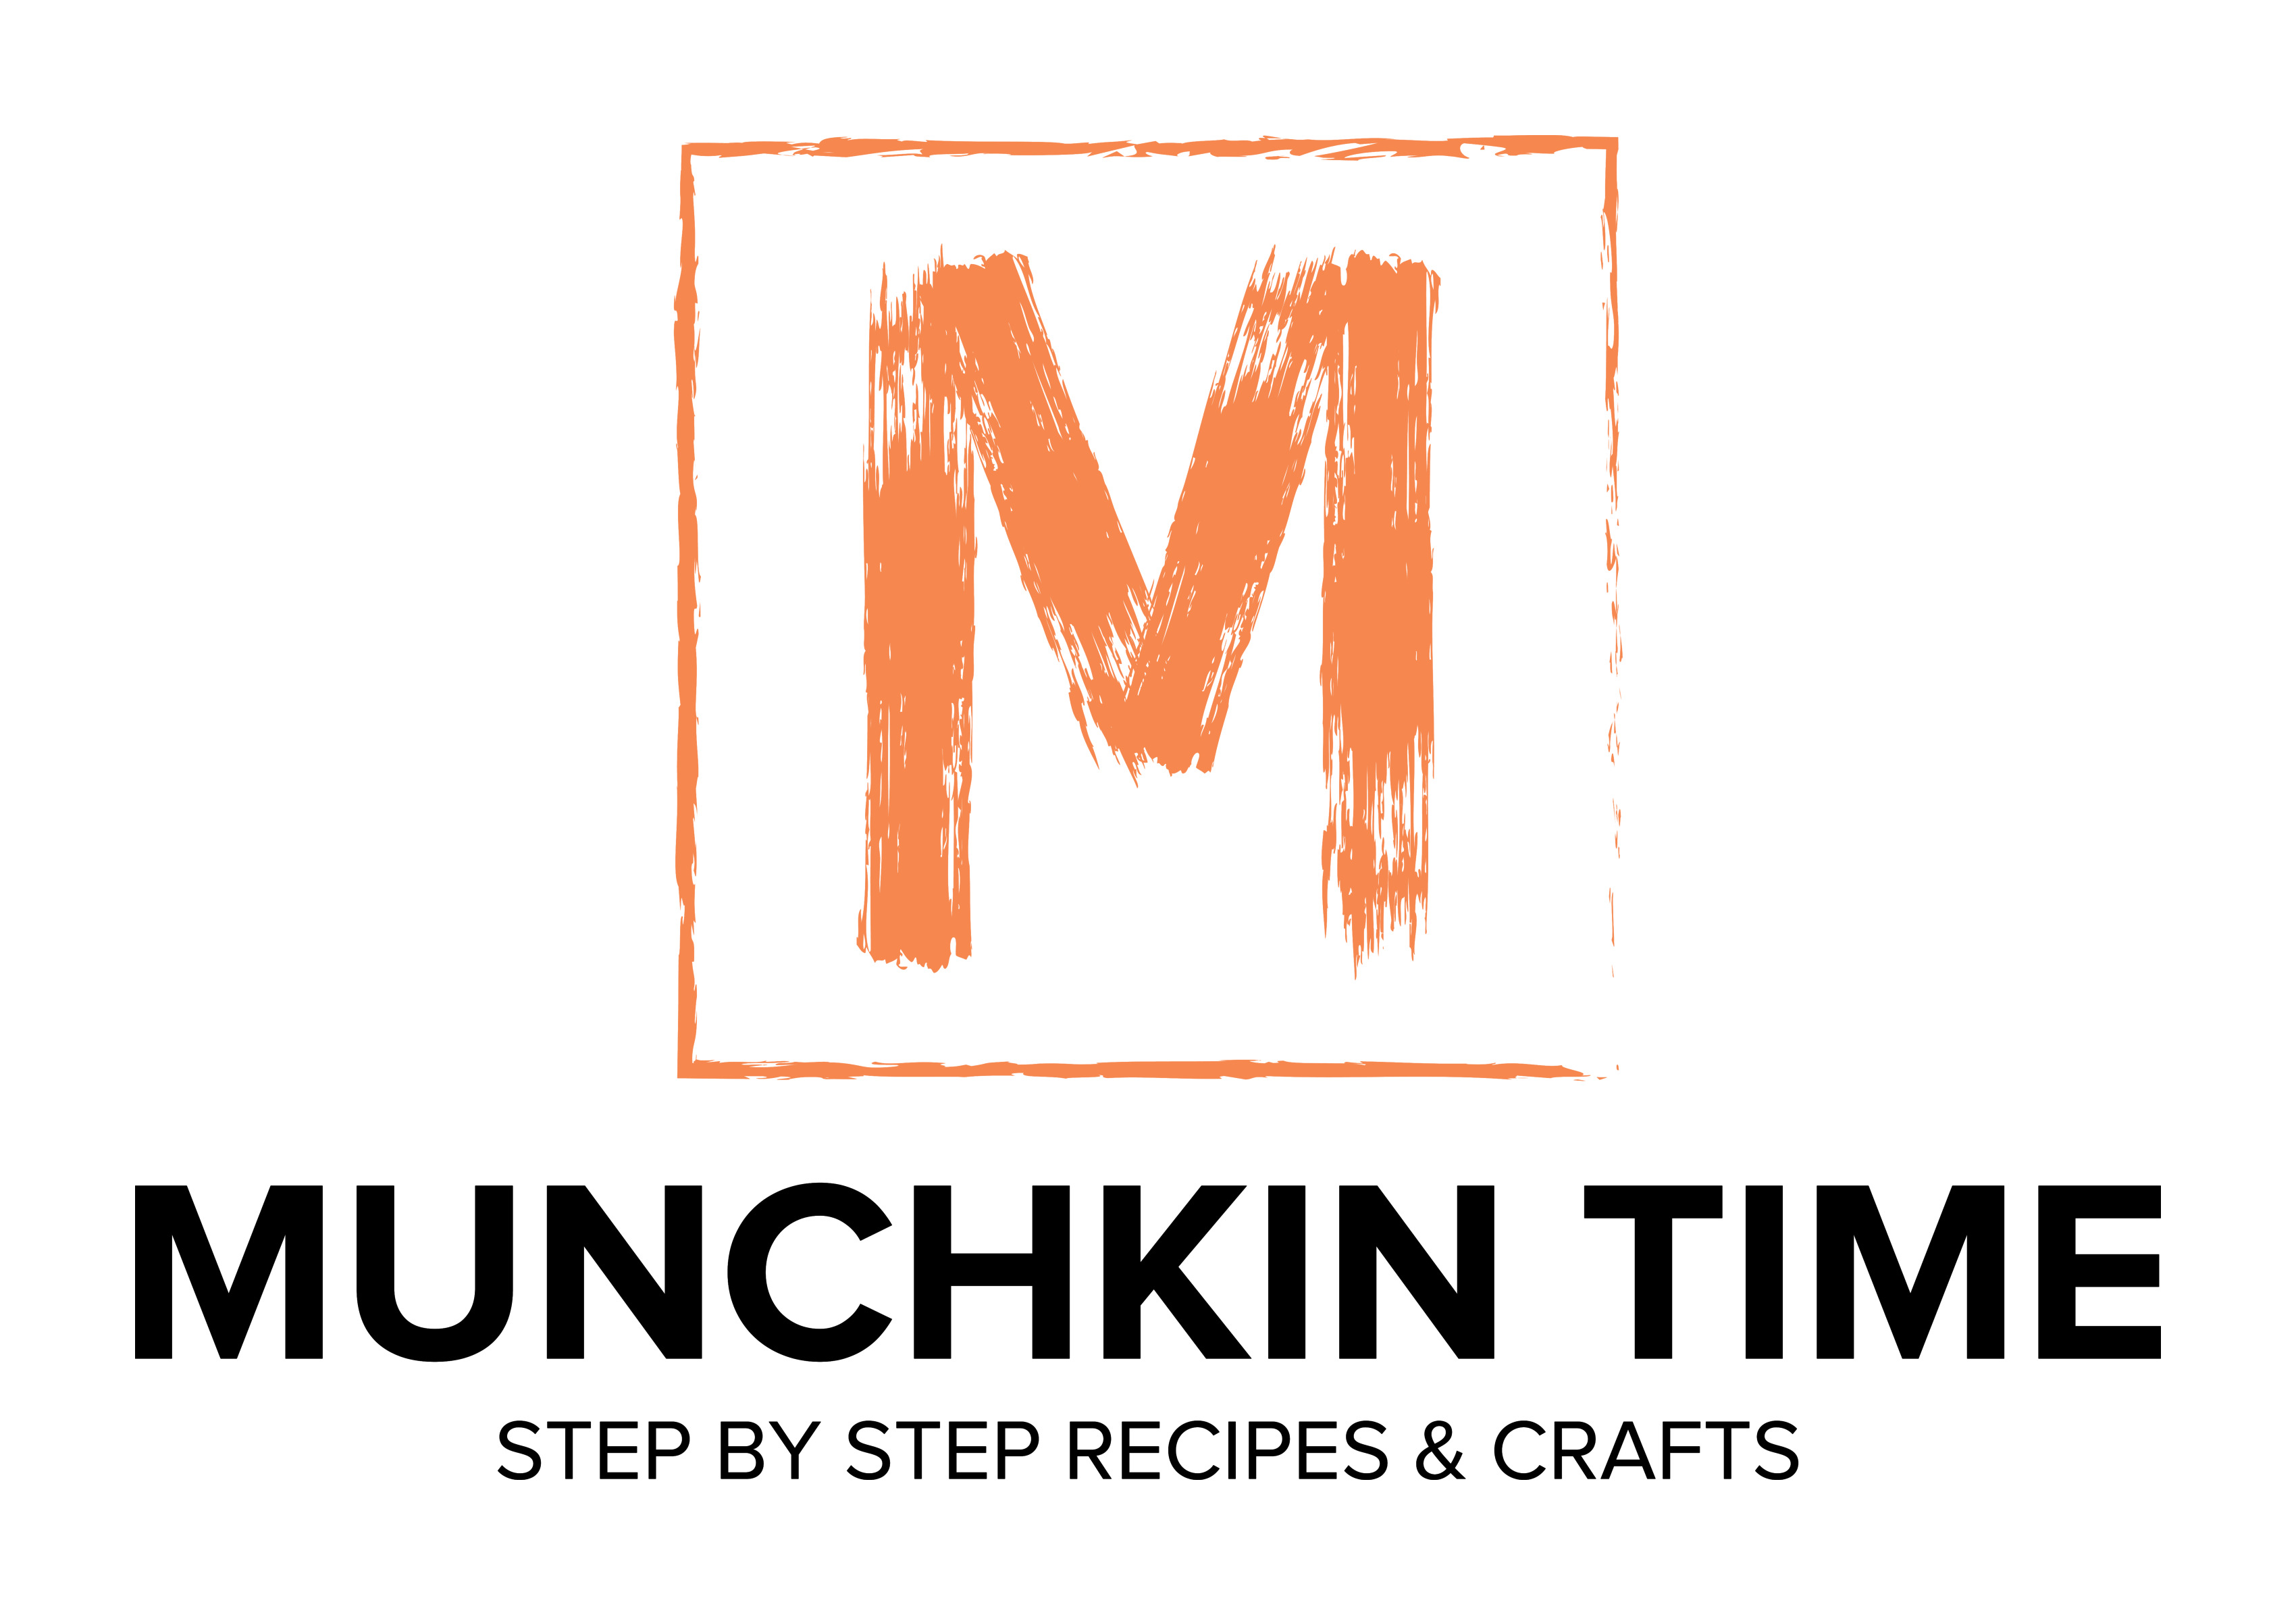 http://www.munchkintime.com/